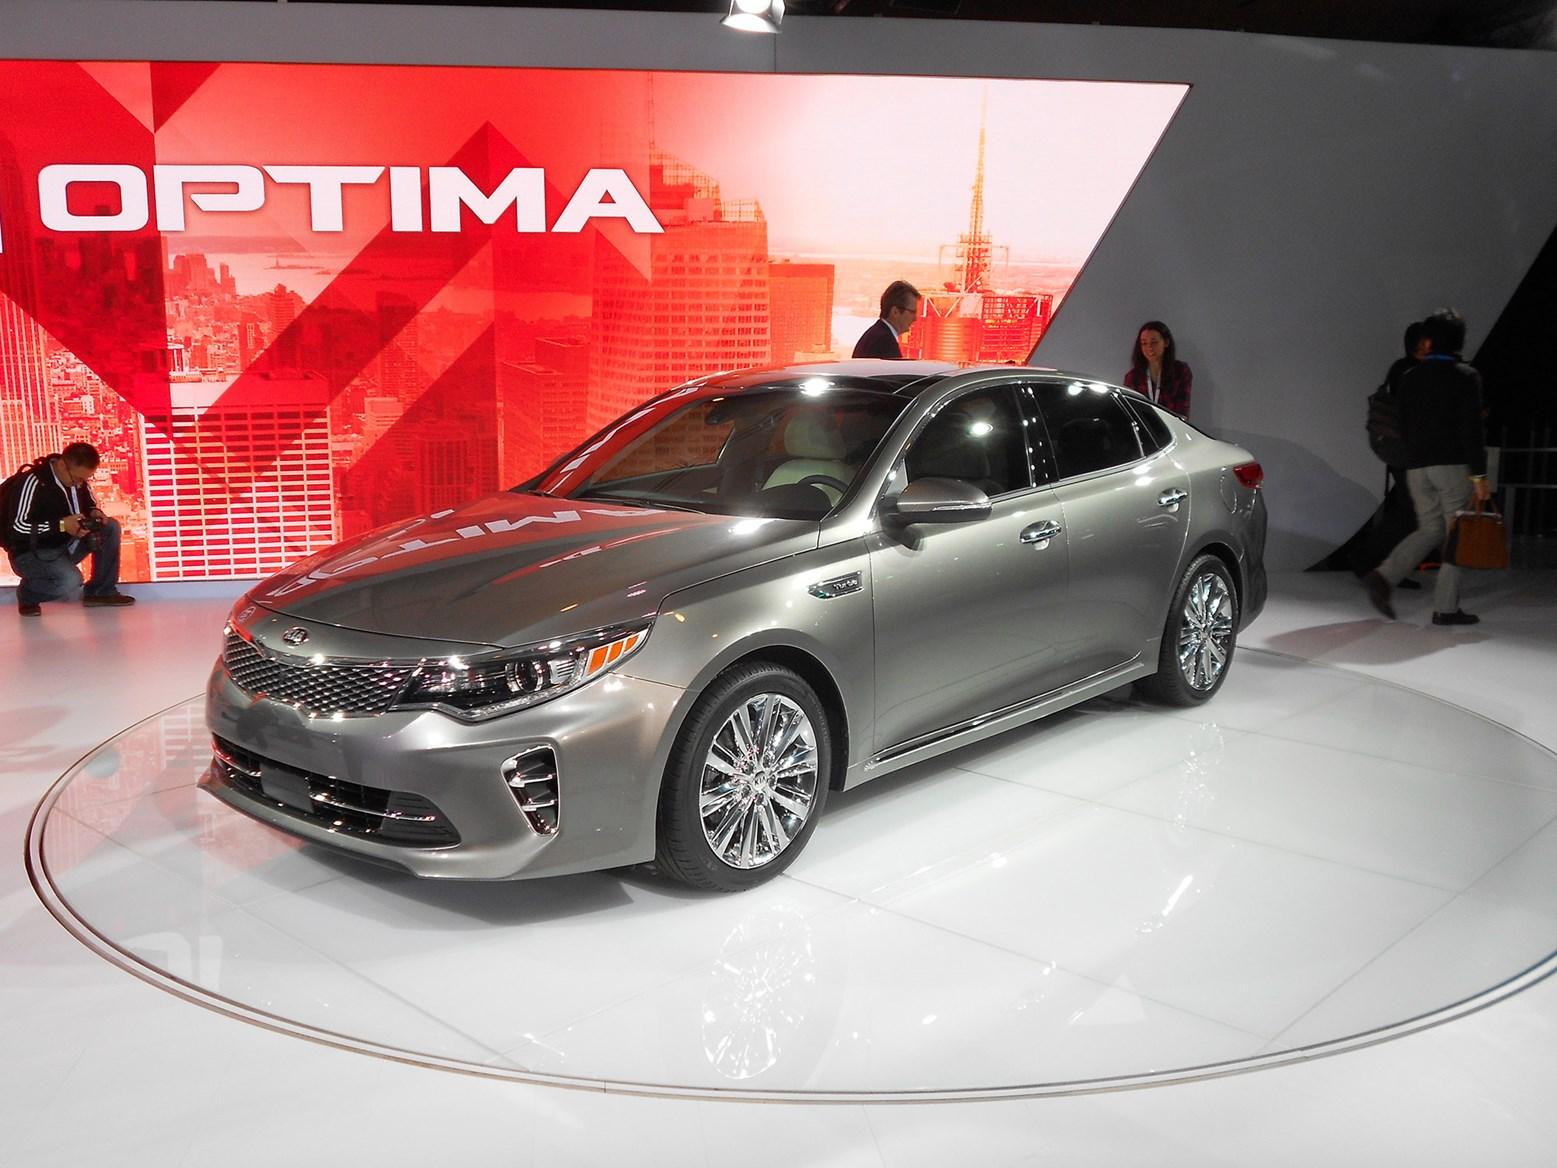 Kia Optima At The New York International Auto Show CAR Magazine - Kia car show